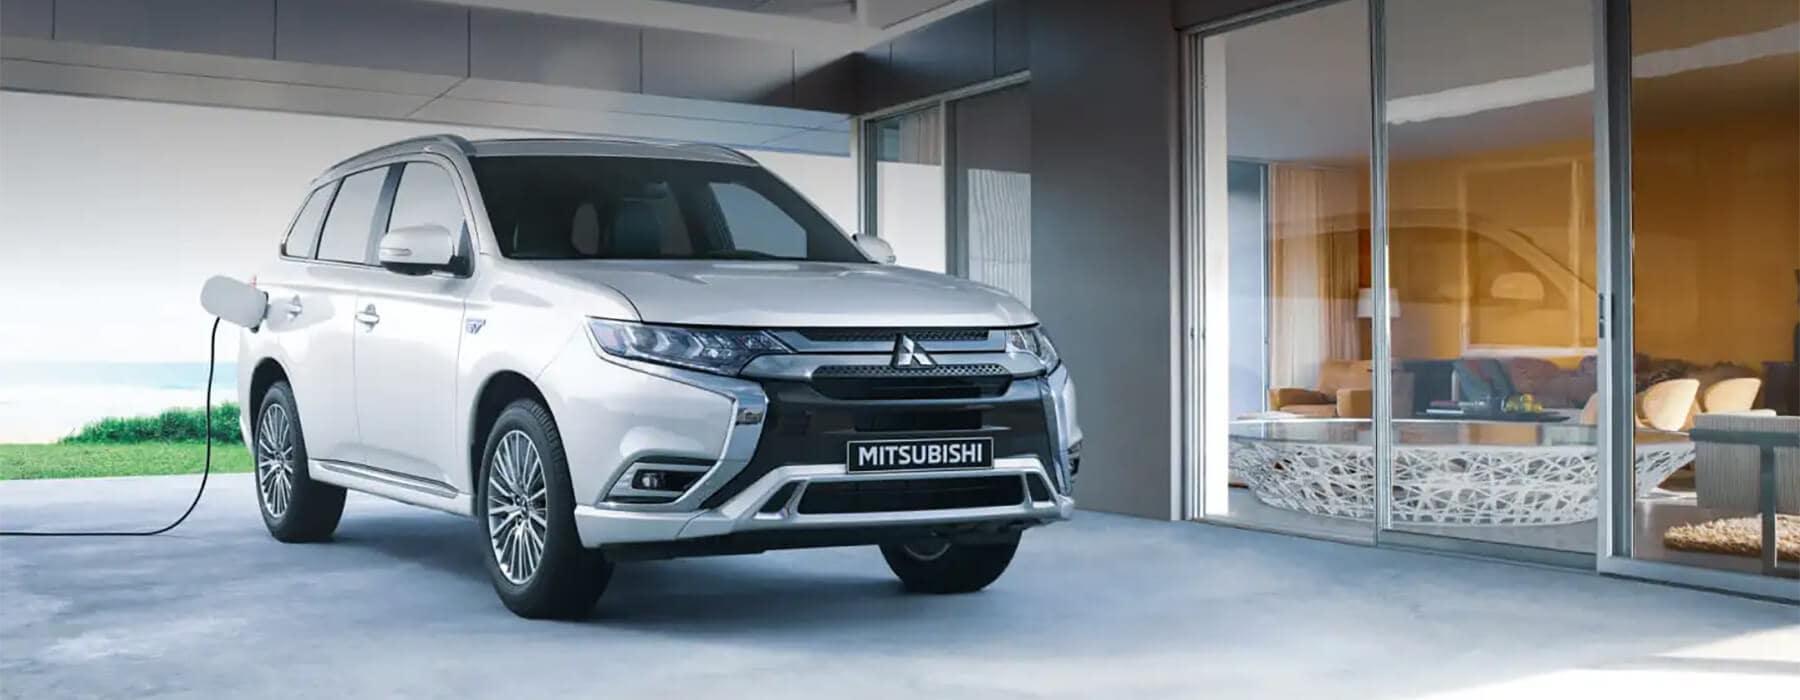 2022 Outlander PHEV Vern Eide Mitsubishi Slider